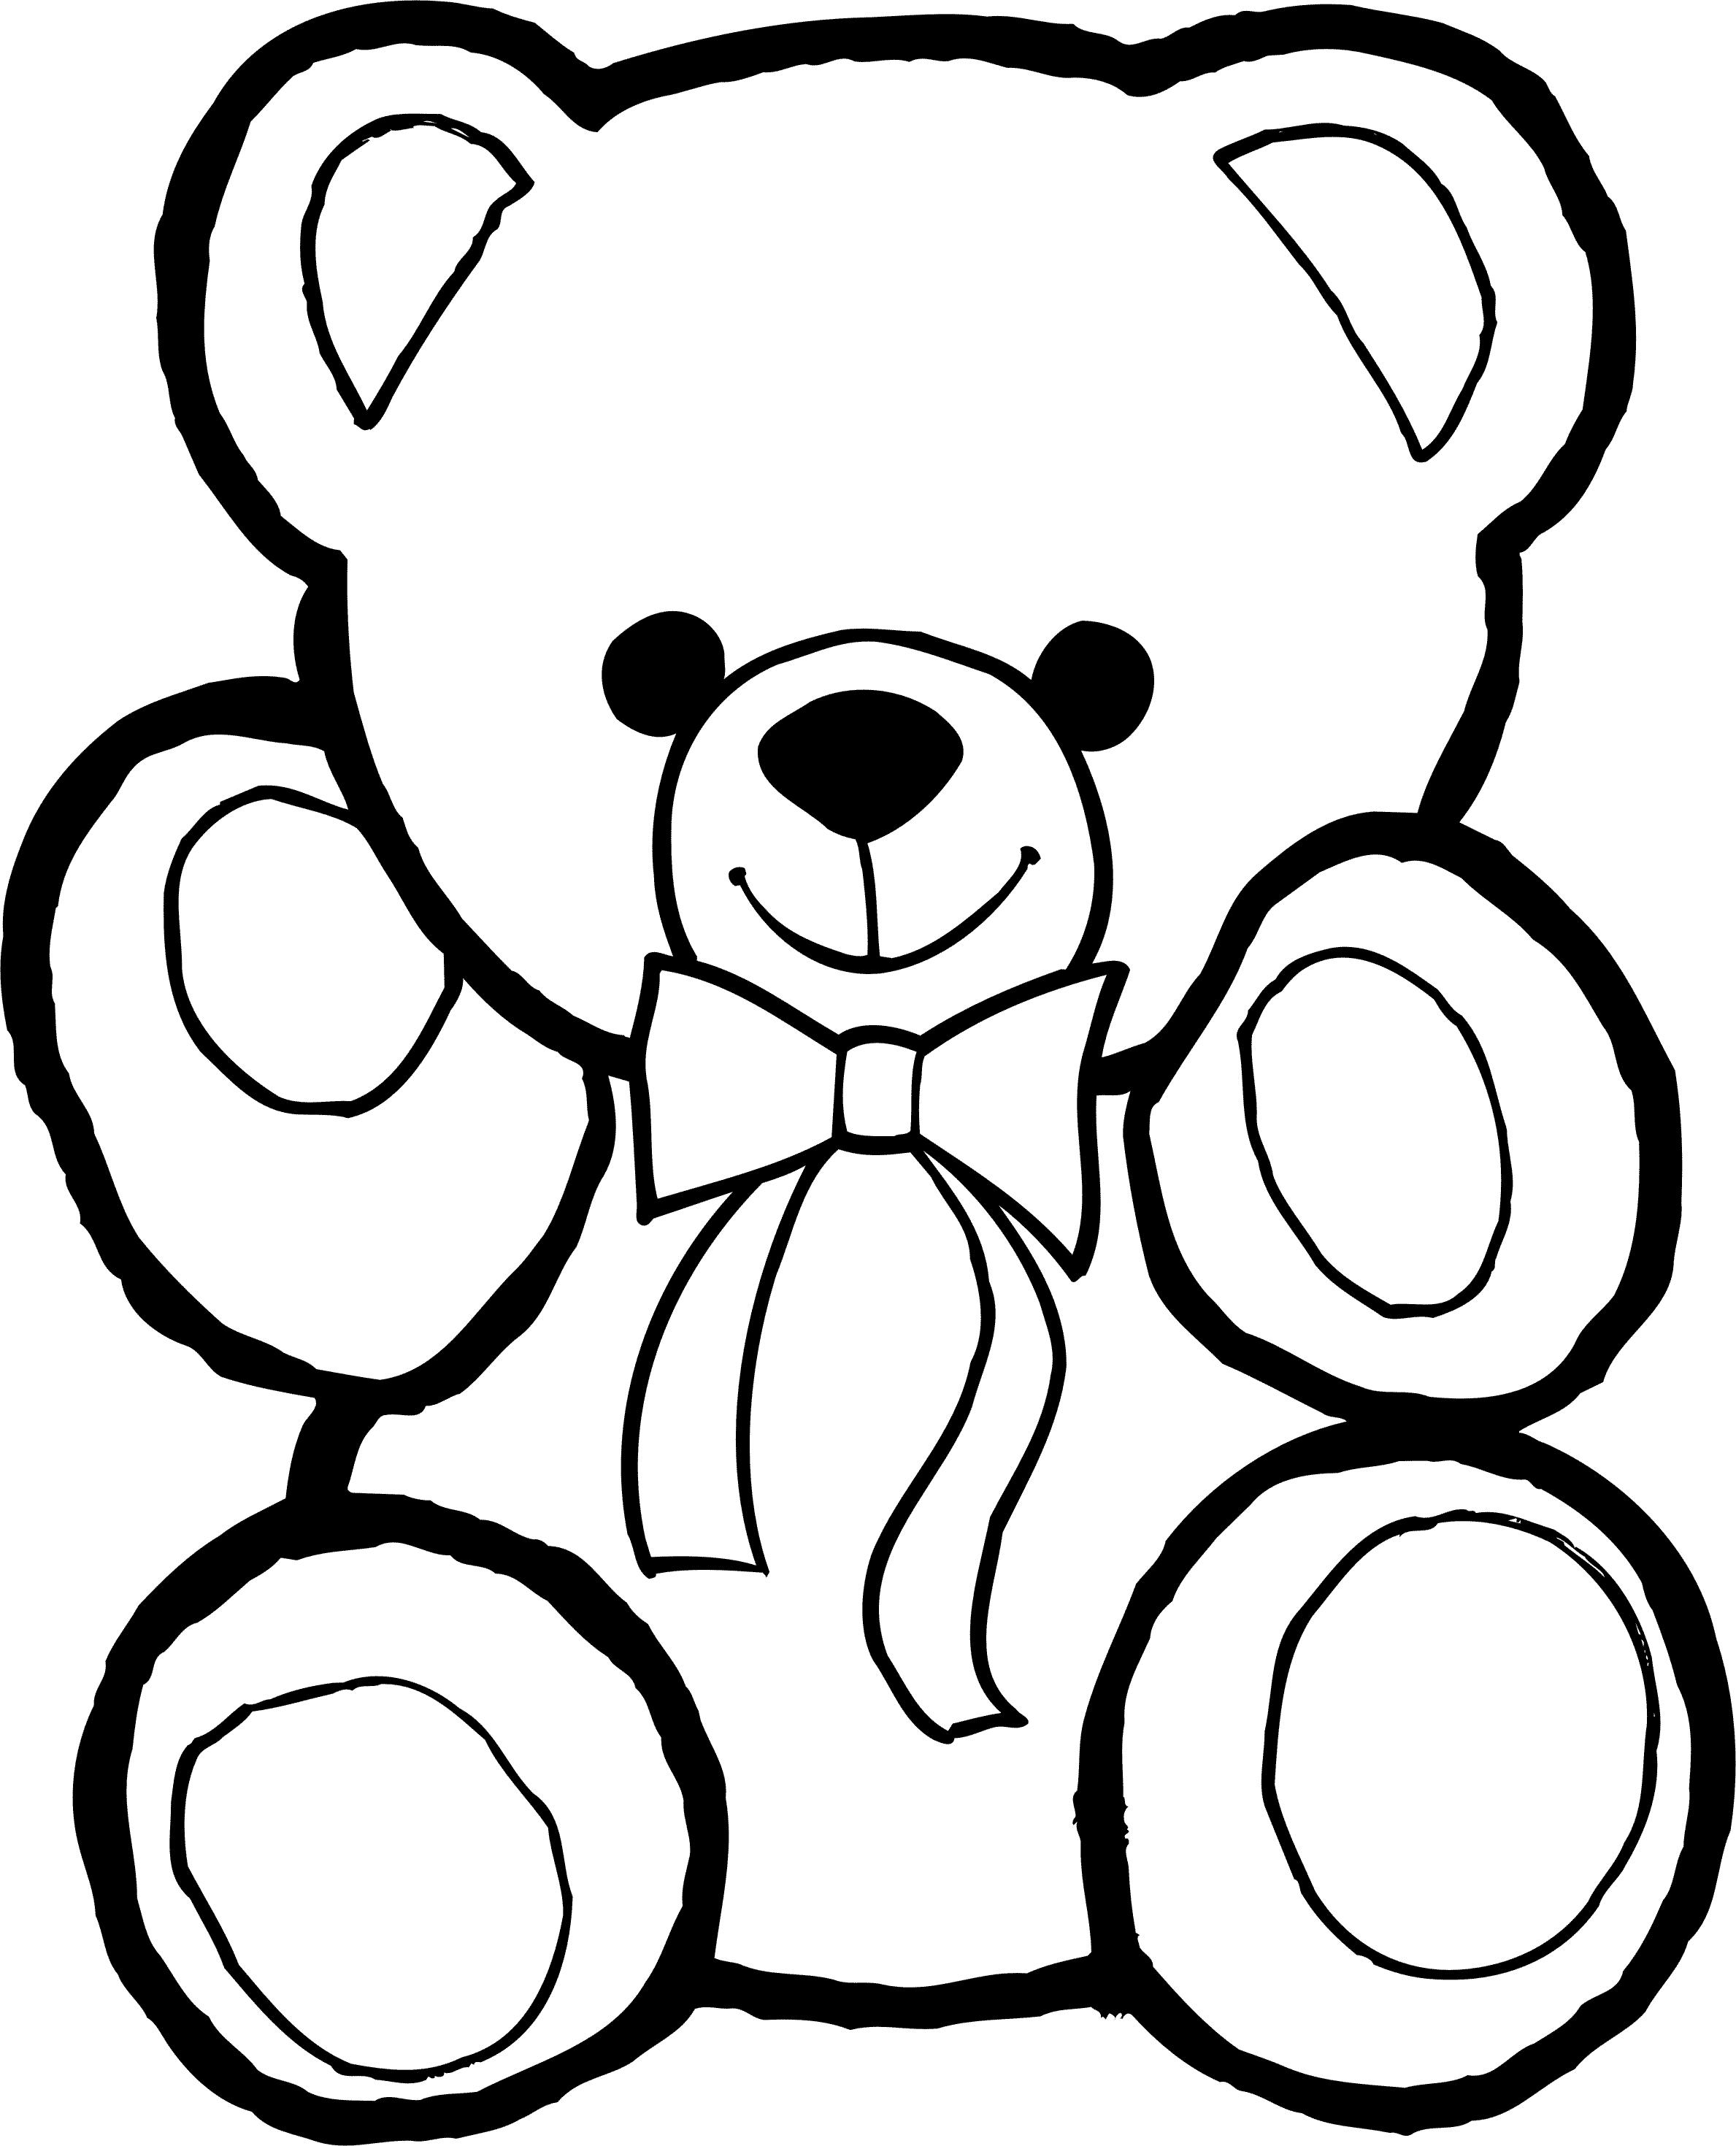 Картинки по запросу мишка игрушка рисунок | Раскраски